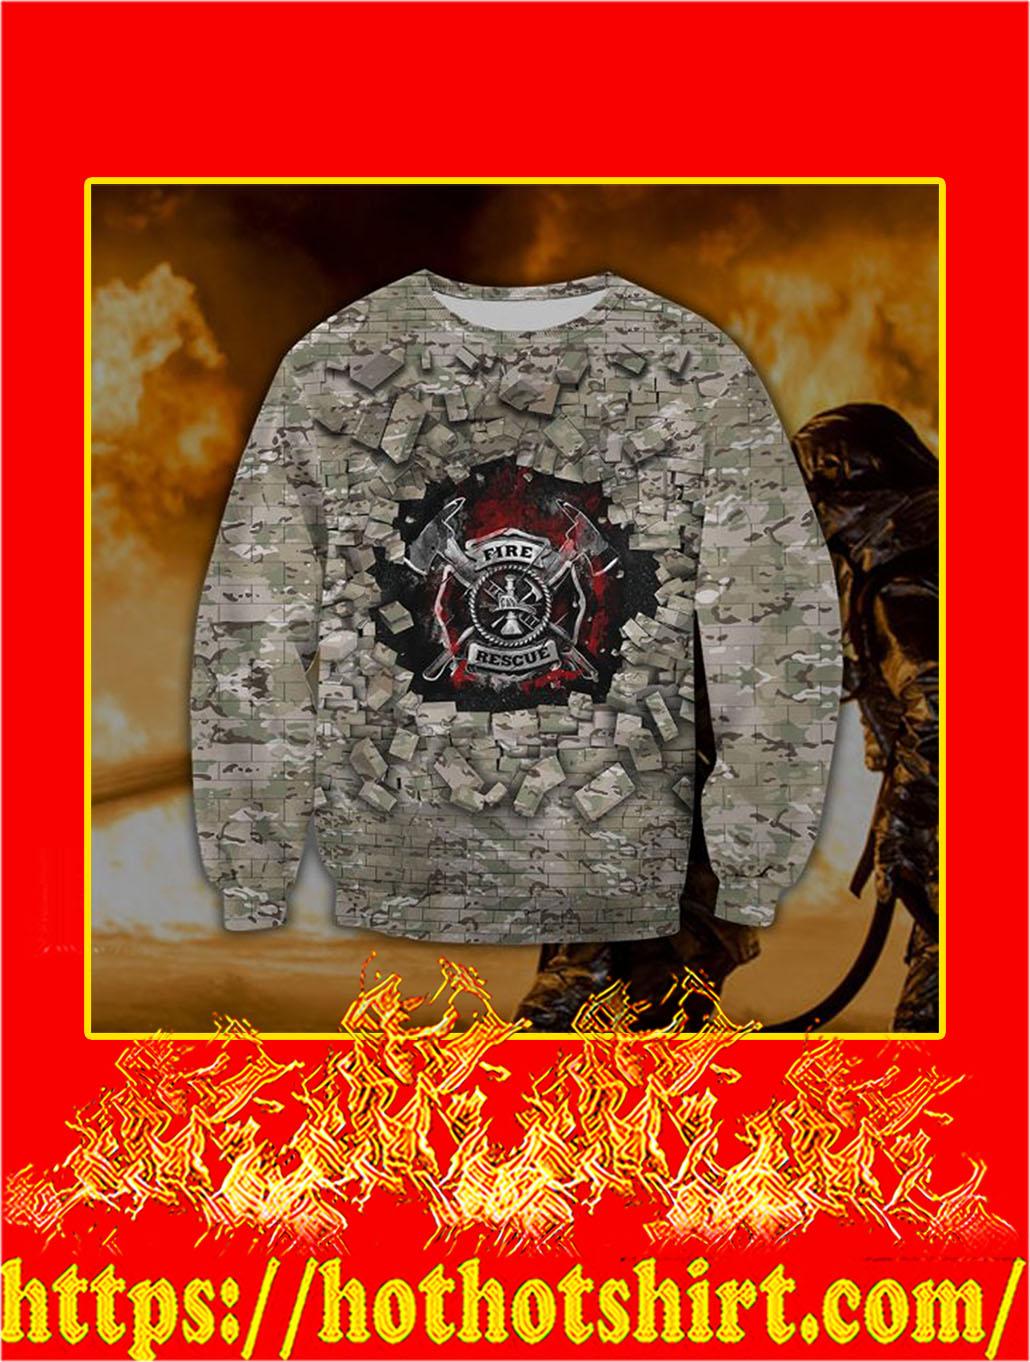 3D Printed Firefighter Camo Wall Clothing Sweatshirt